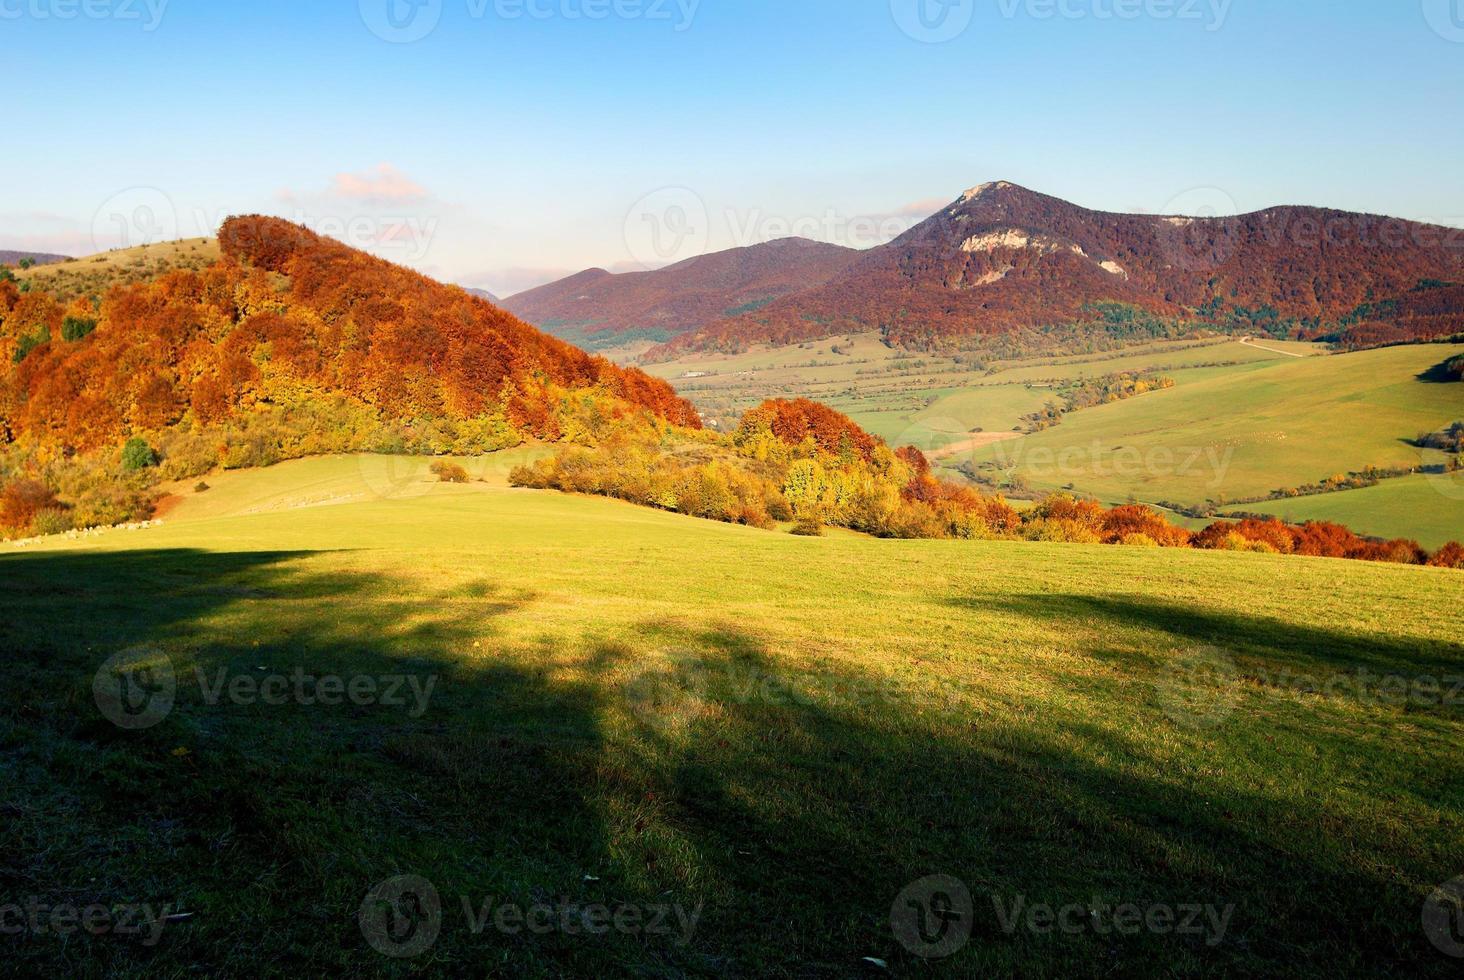 vista outonal do monte strazov em strazovske vrchy foto